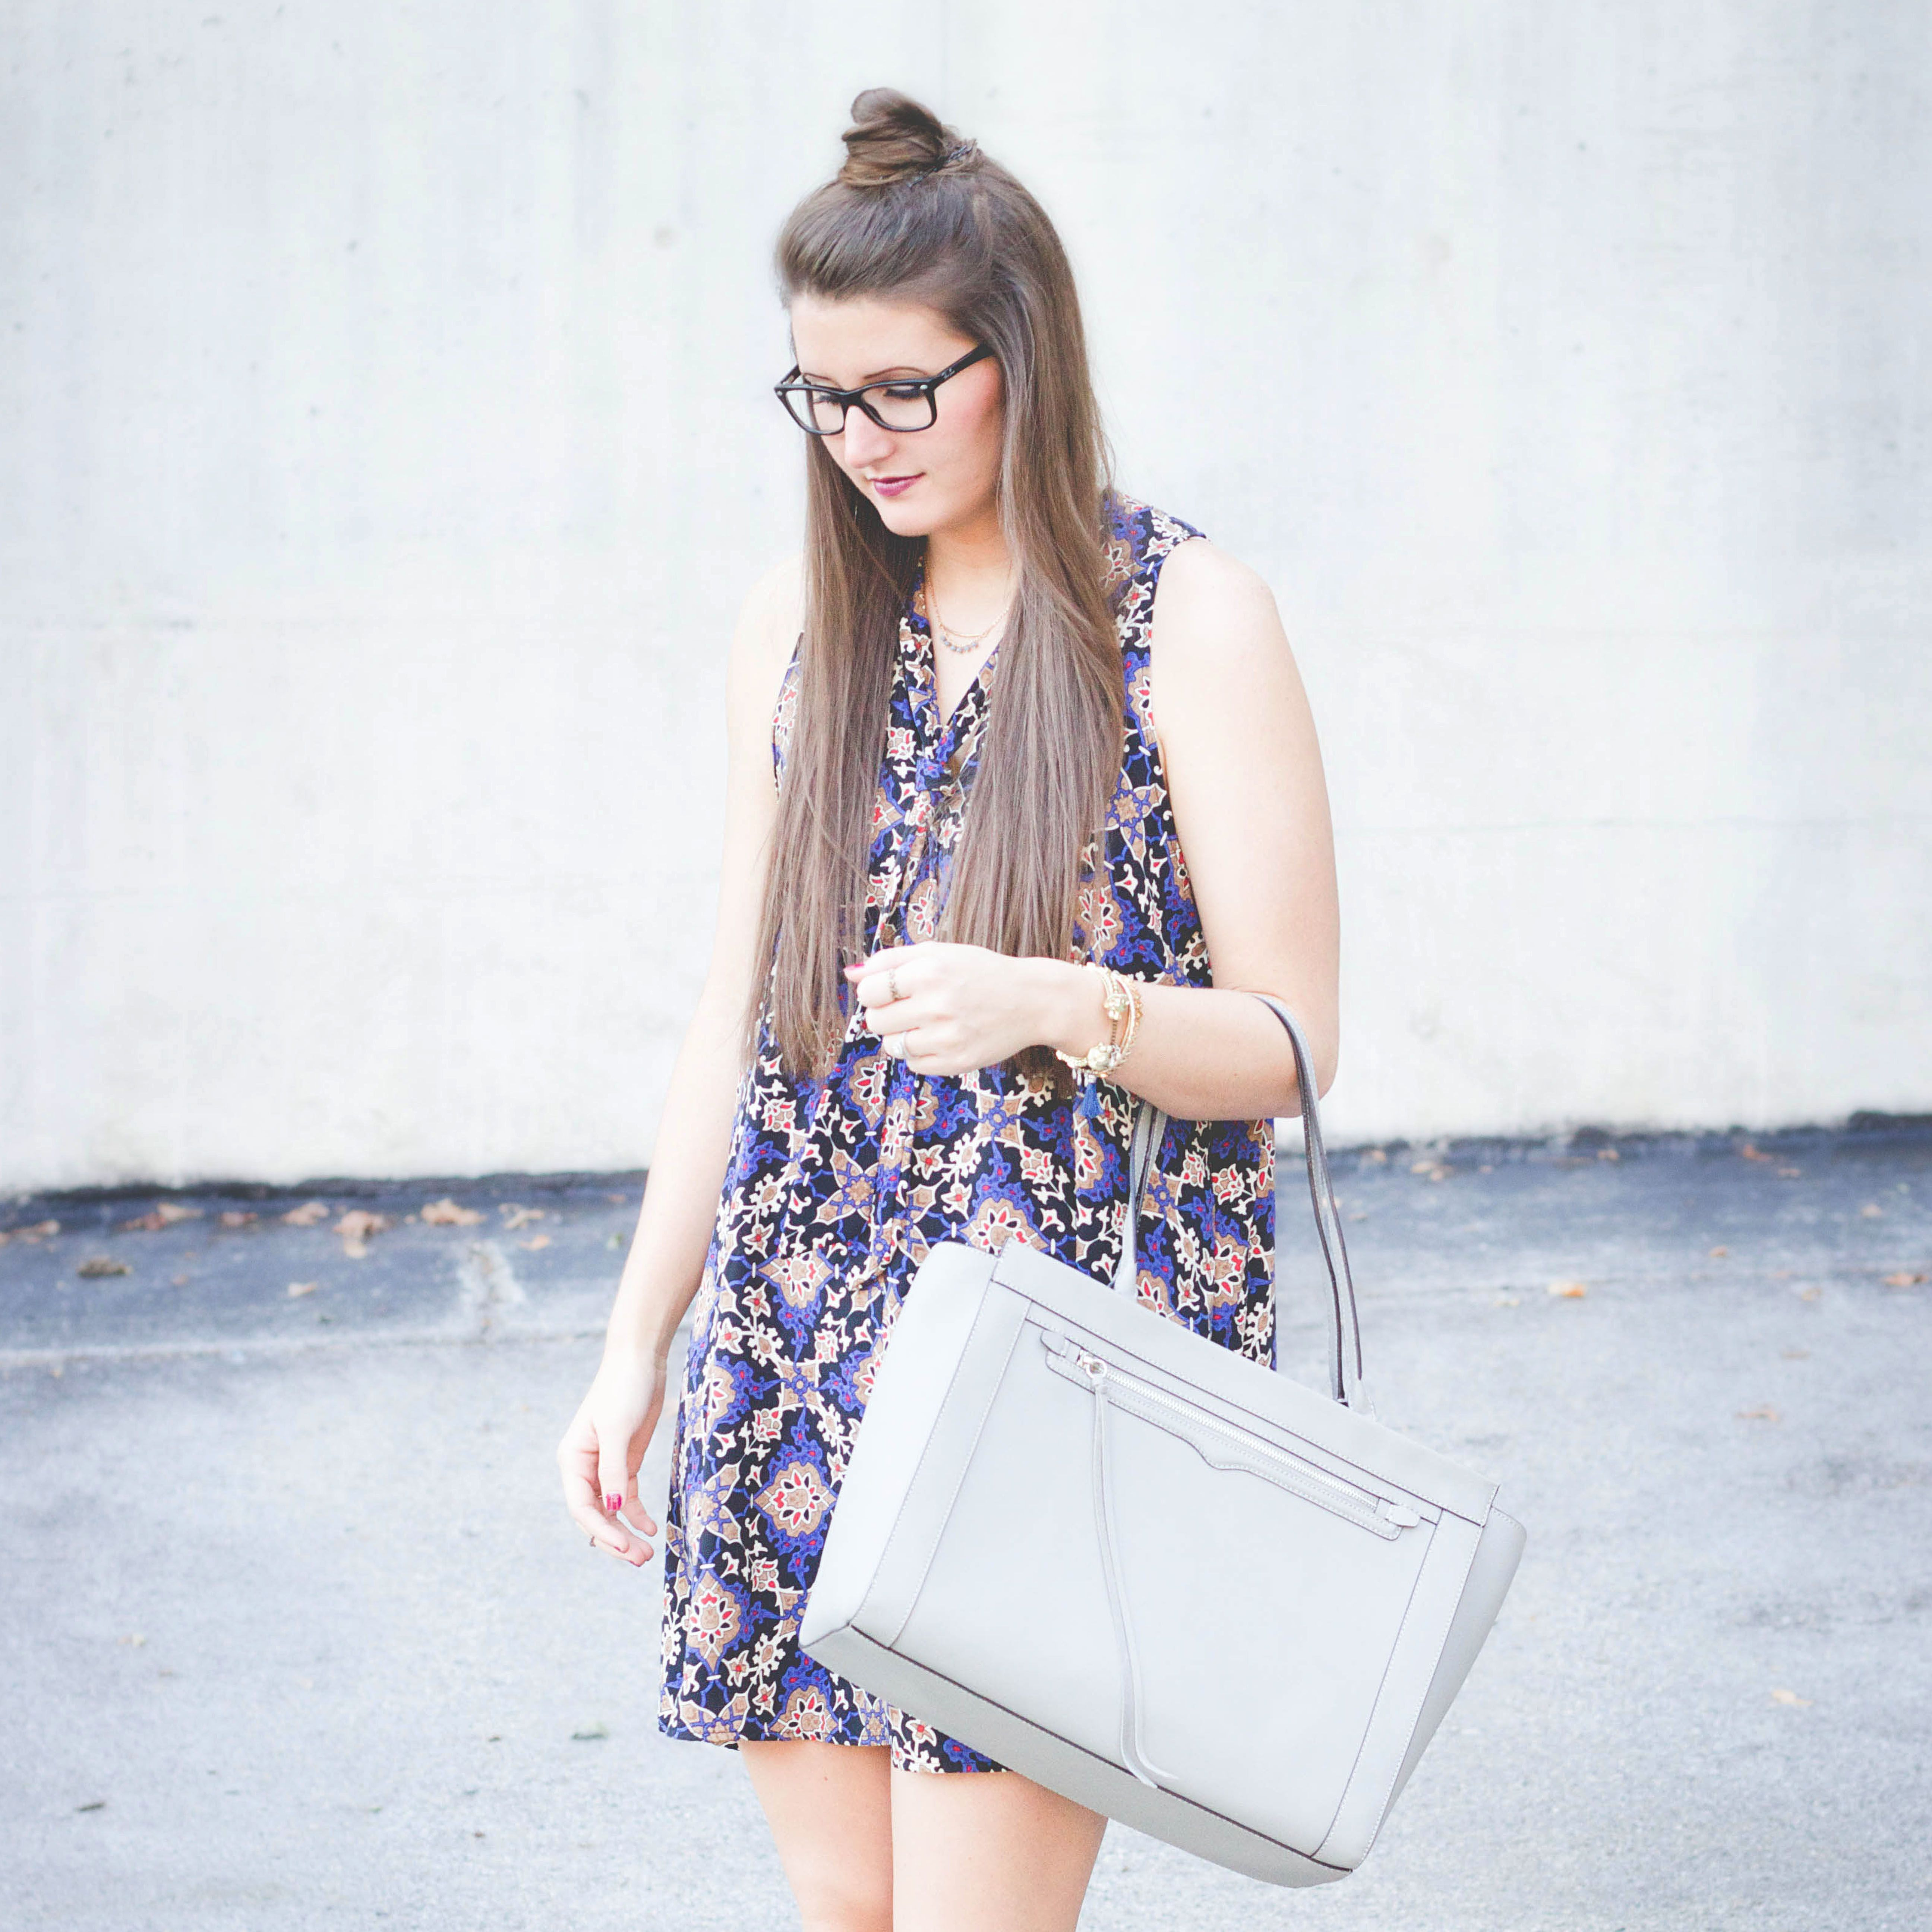 fall fashion grey purse swing dress s dress half bun my